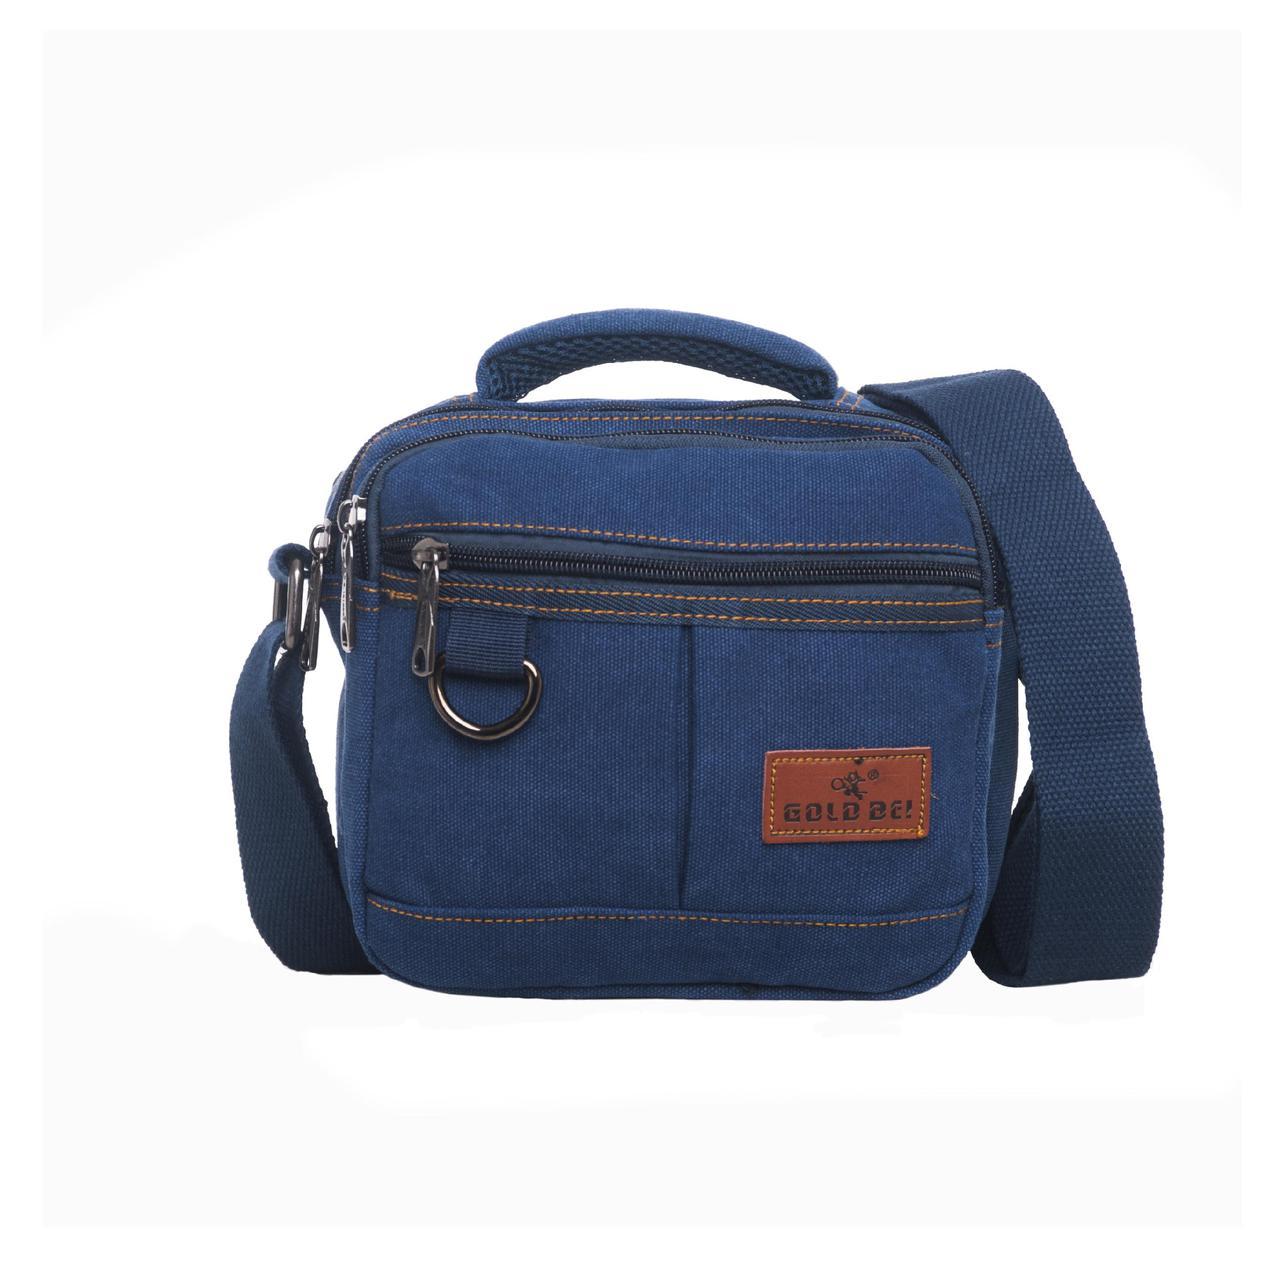 Мужская сумка GOLD BE горизонтальная  20х19х12 материал синий брезент ксС555син